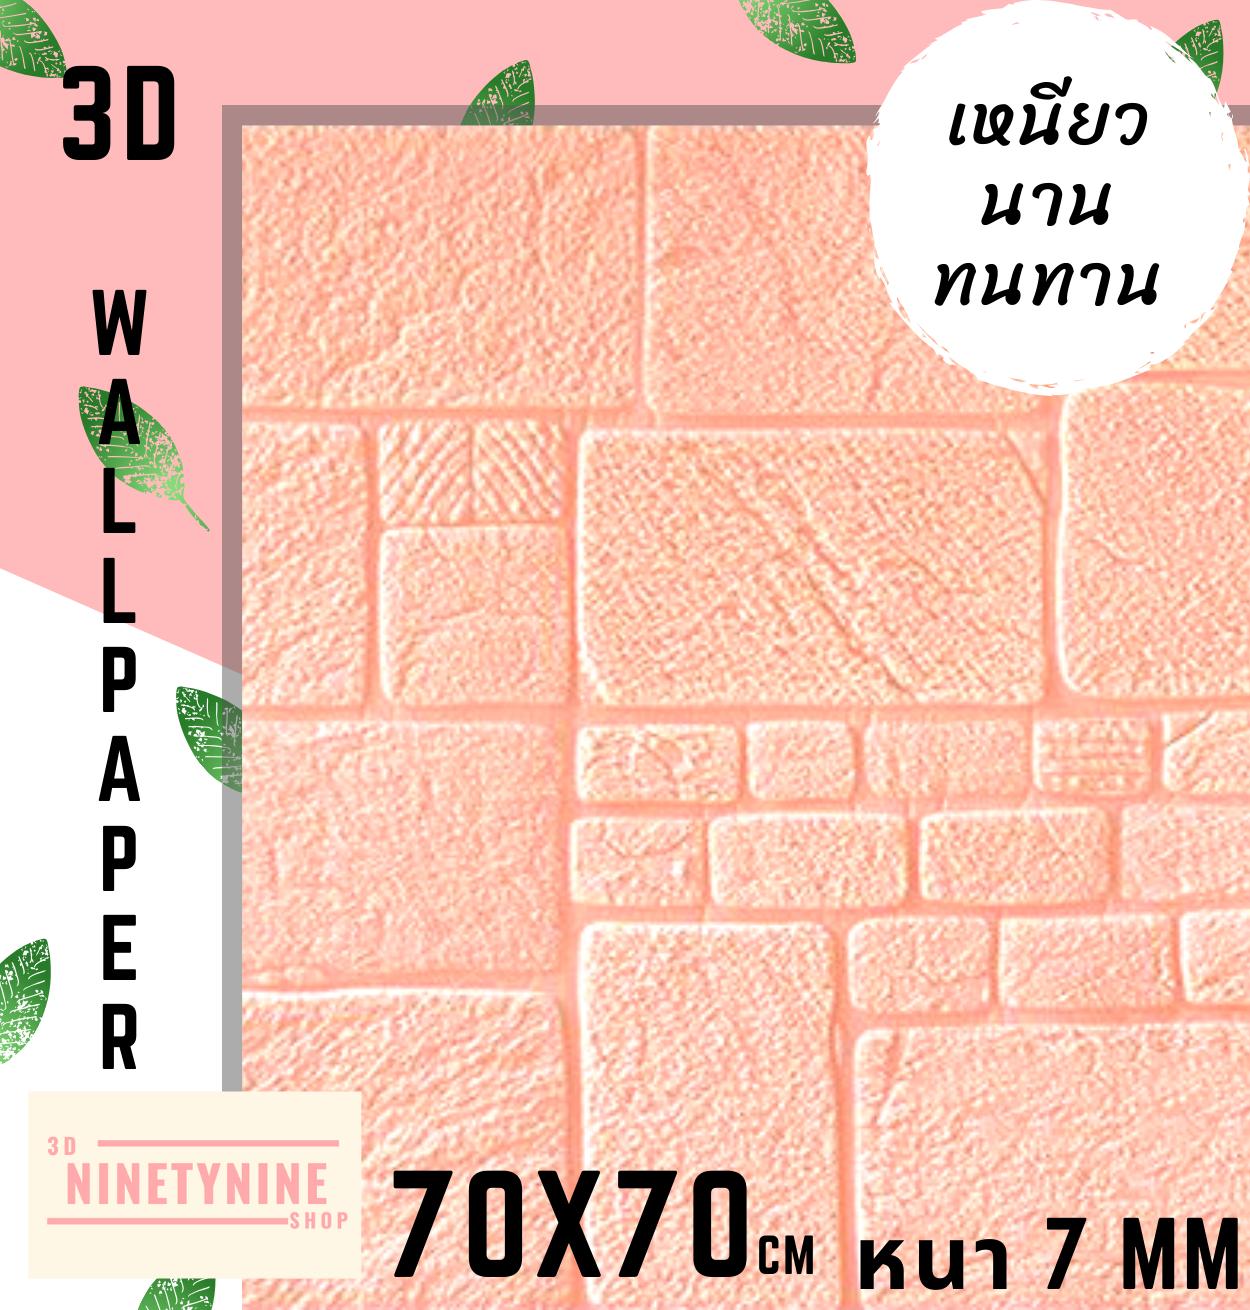 3d Wallpaper วอลเปเปอร์ สามมิติ สติ๊กเกอร์ติดผนัง มีกาวติดผนังในตัว วัสดุ Pe Foam กันน้ำ กันเสียง กันกระแทก ลายอิฐ ลายหิน (10แผ่นขึ้นไปฟรีคัตเตอร์).